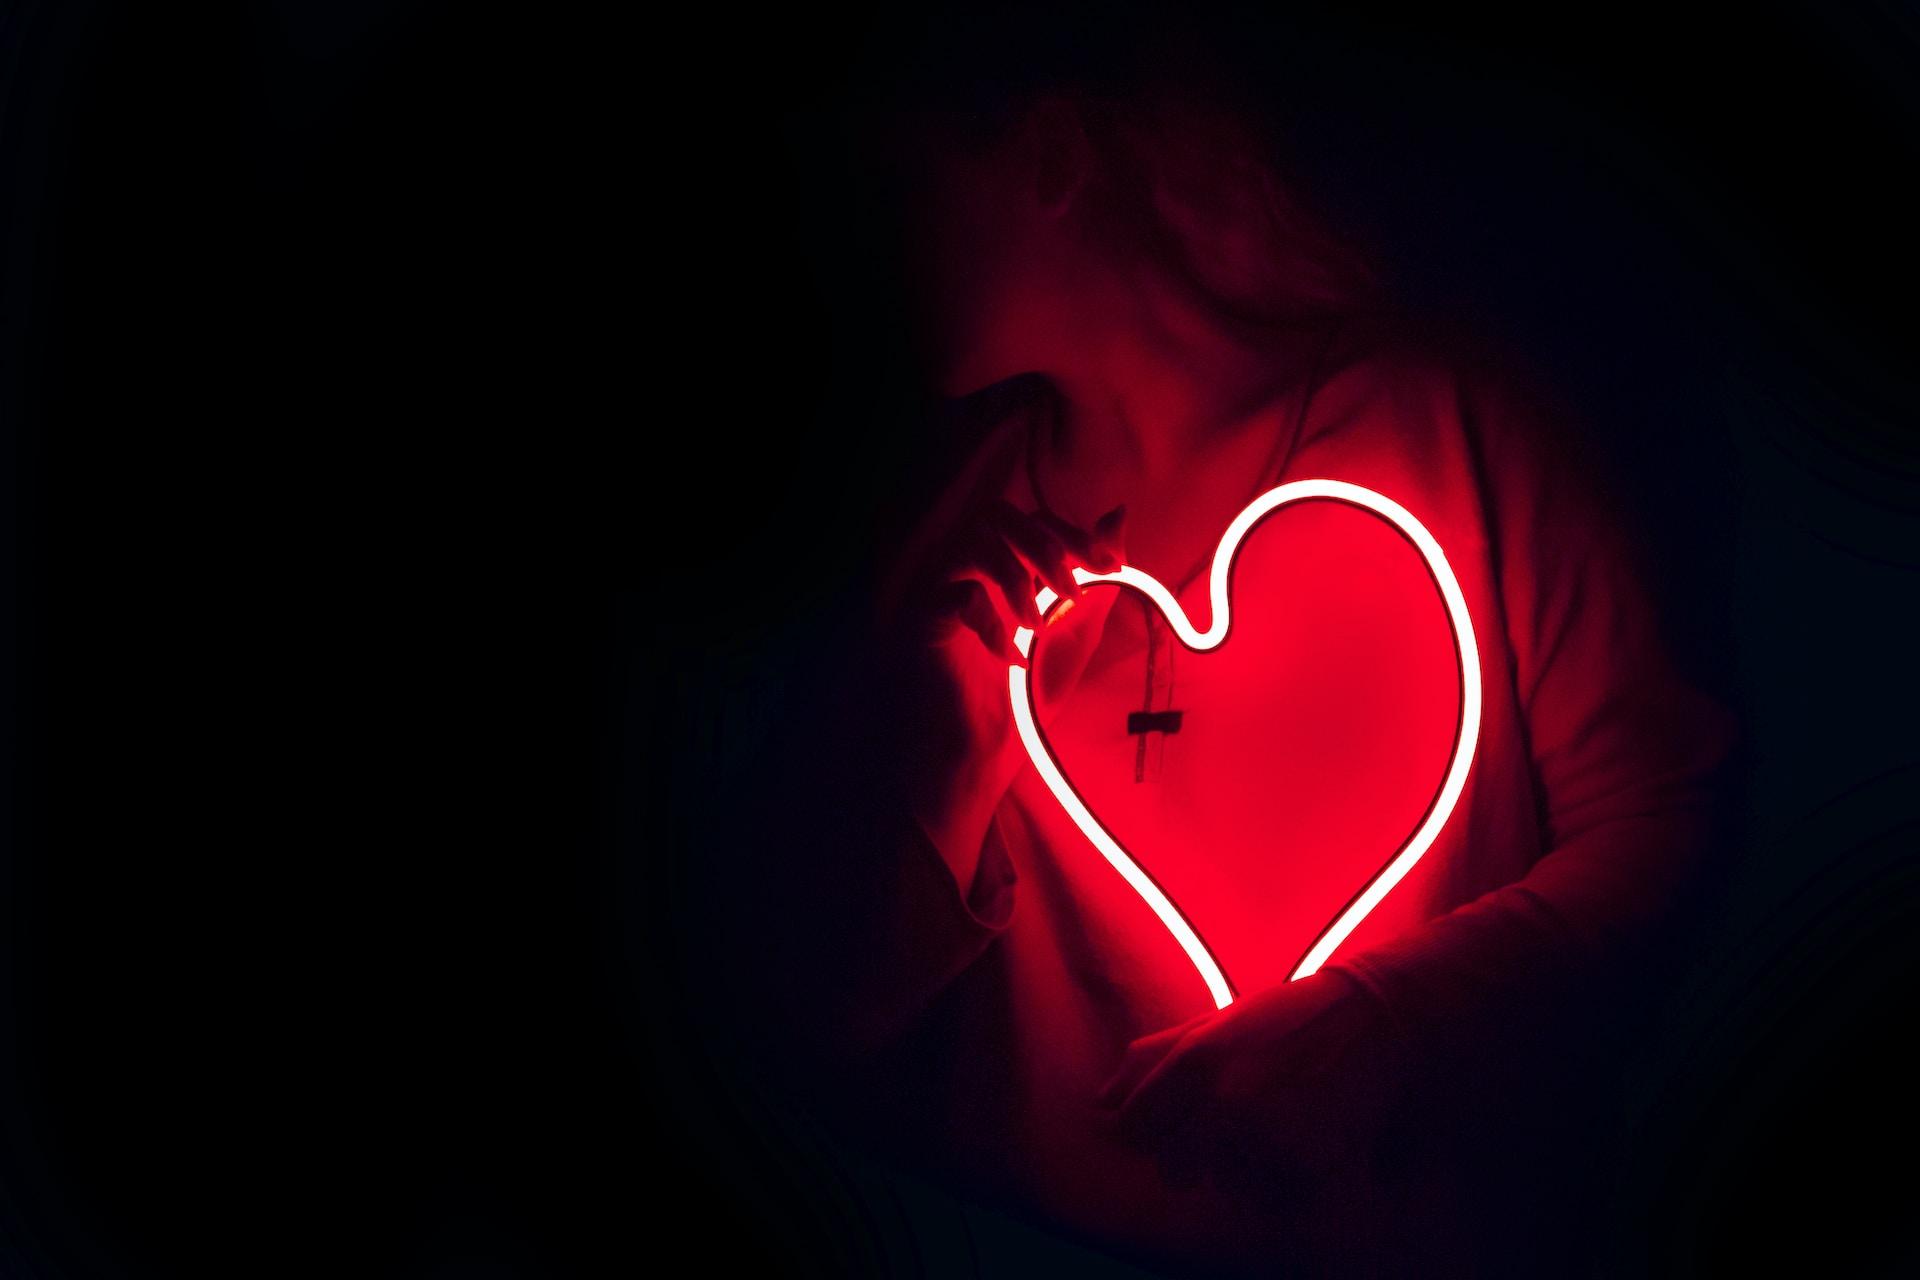 BIG-HEARTED GIRL SEEKING LOVE